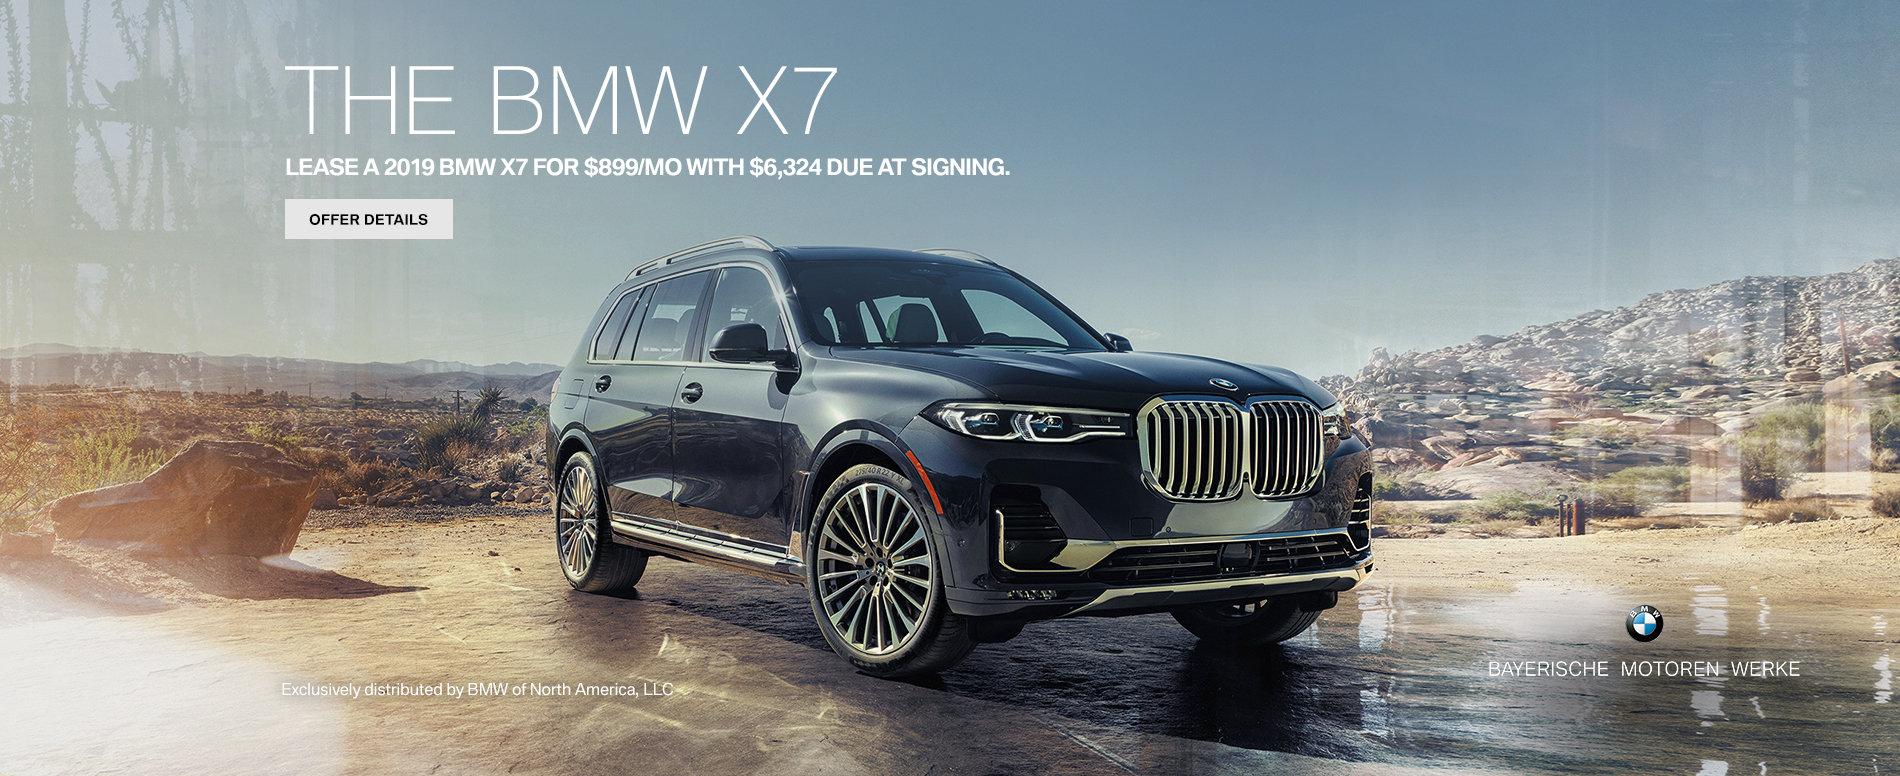 New & Used BMW Car Dealer - Stamford, Greenwich, CT & Rye